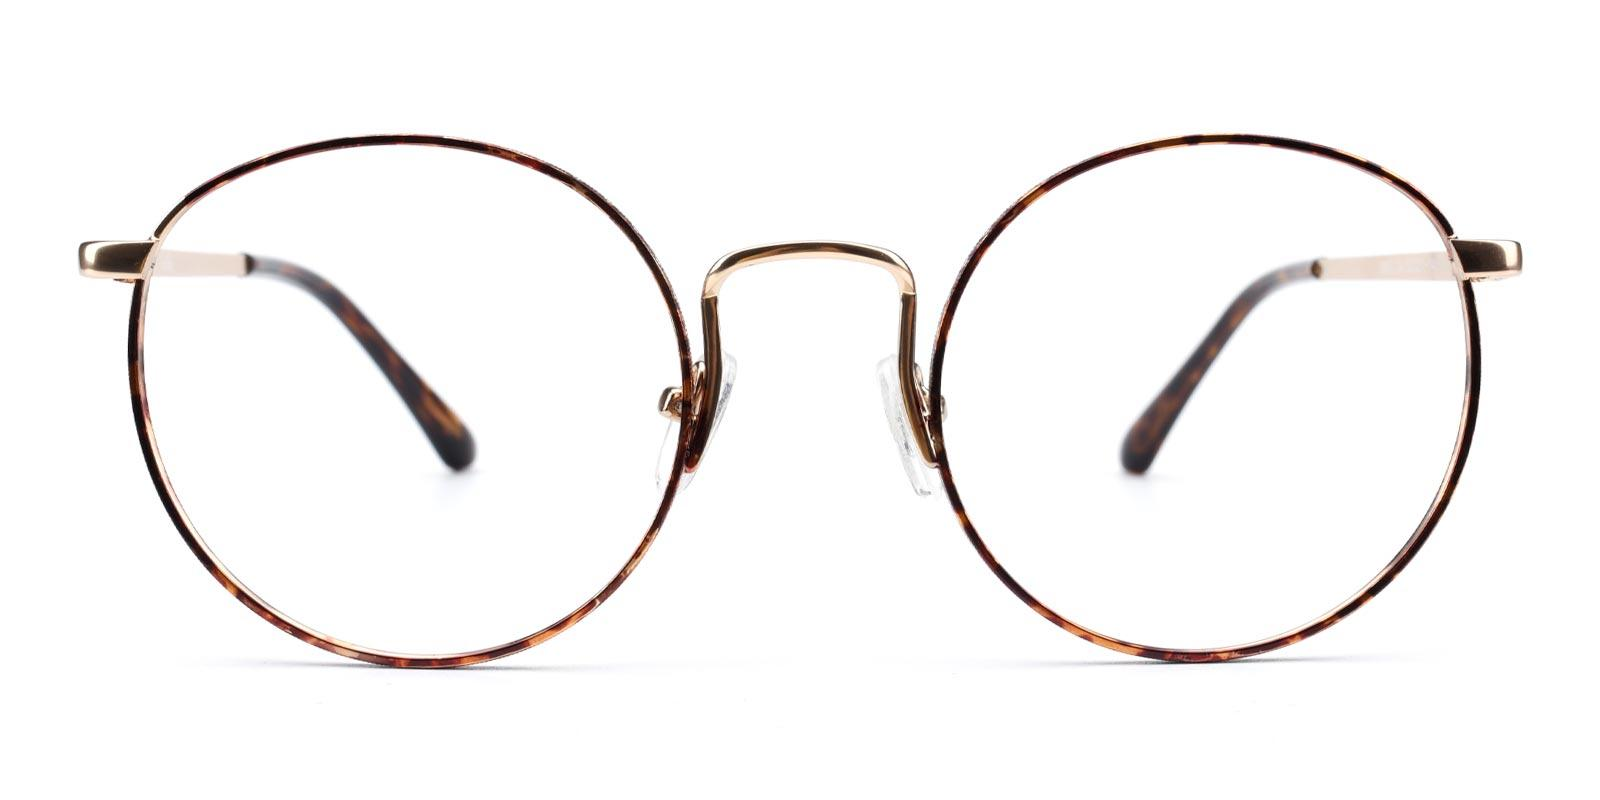 Bertha-Tortoise-Round-Metal-Eyeglasses-detail